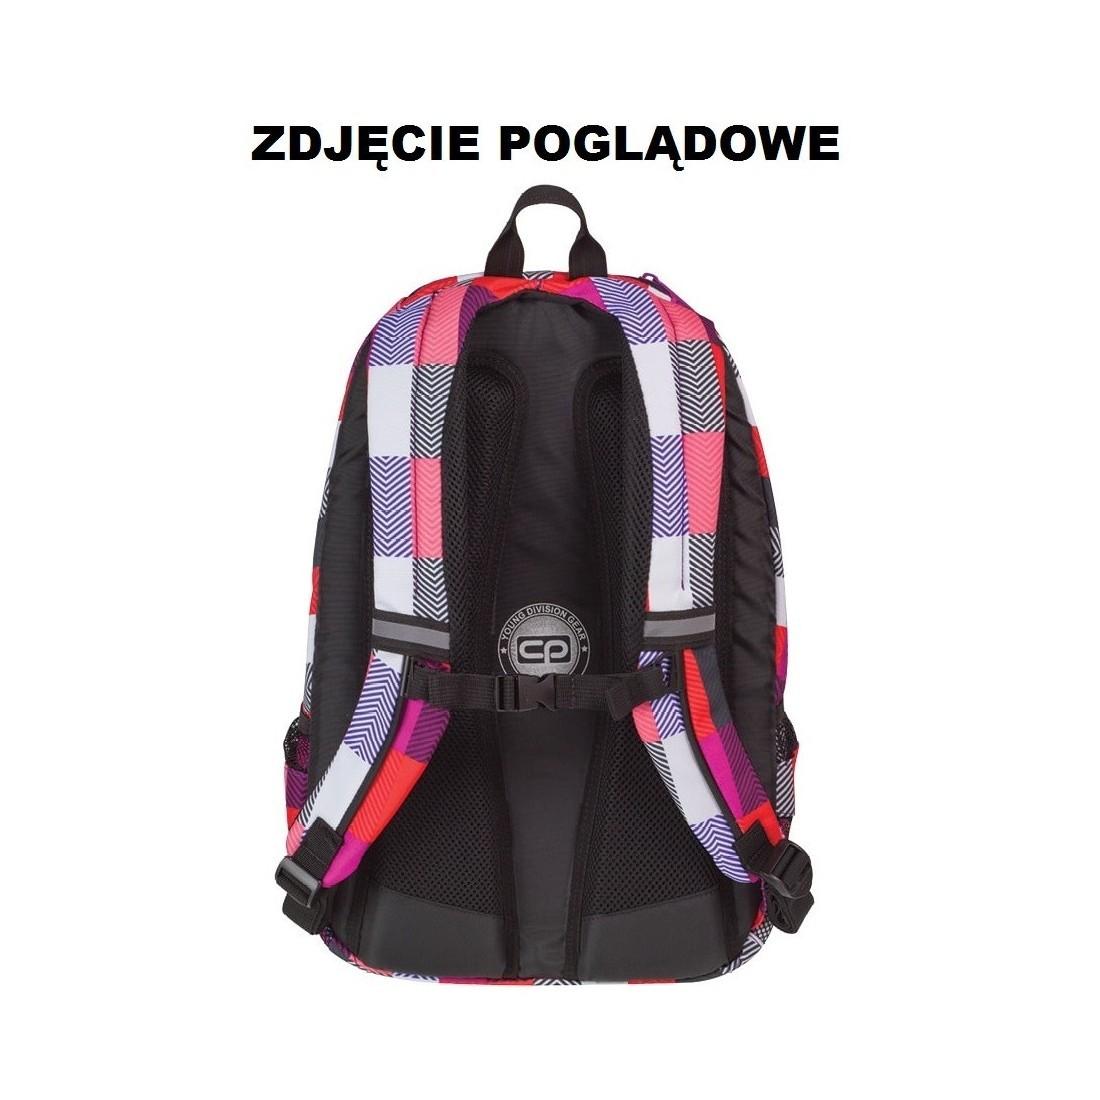 Plecak młodzieżowy CoolPack CP 923 Urban Snow Hills dla